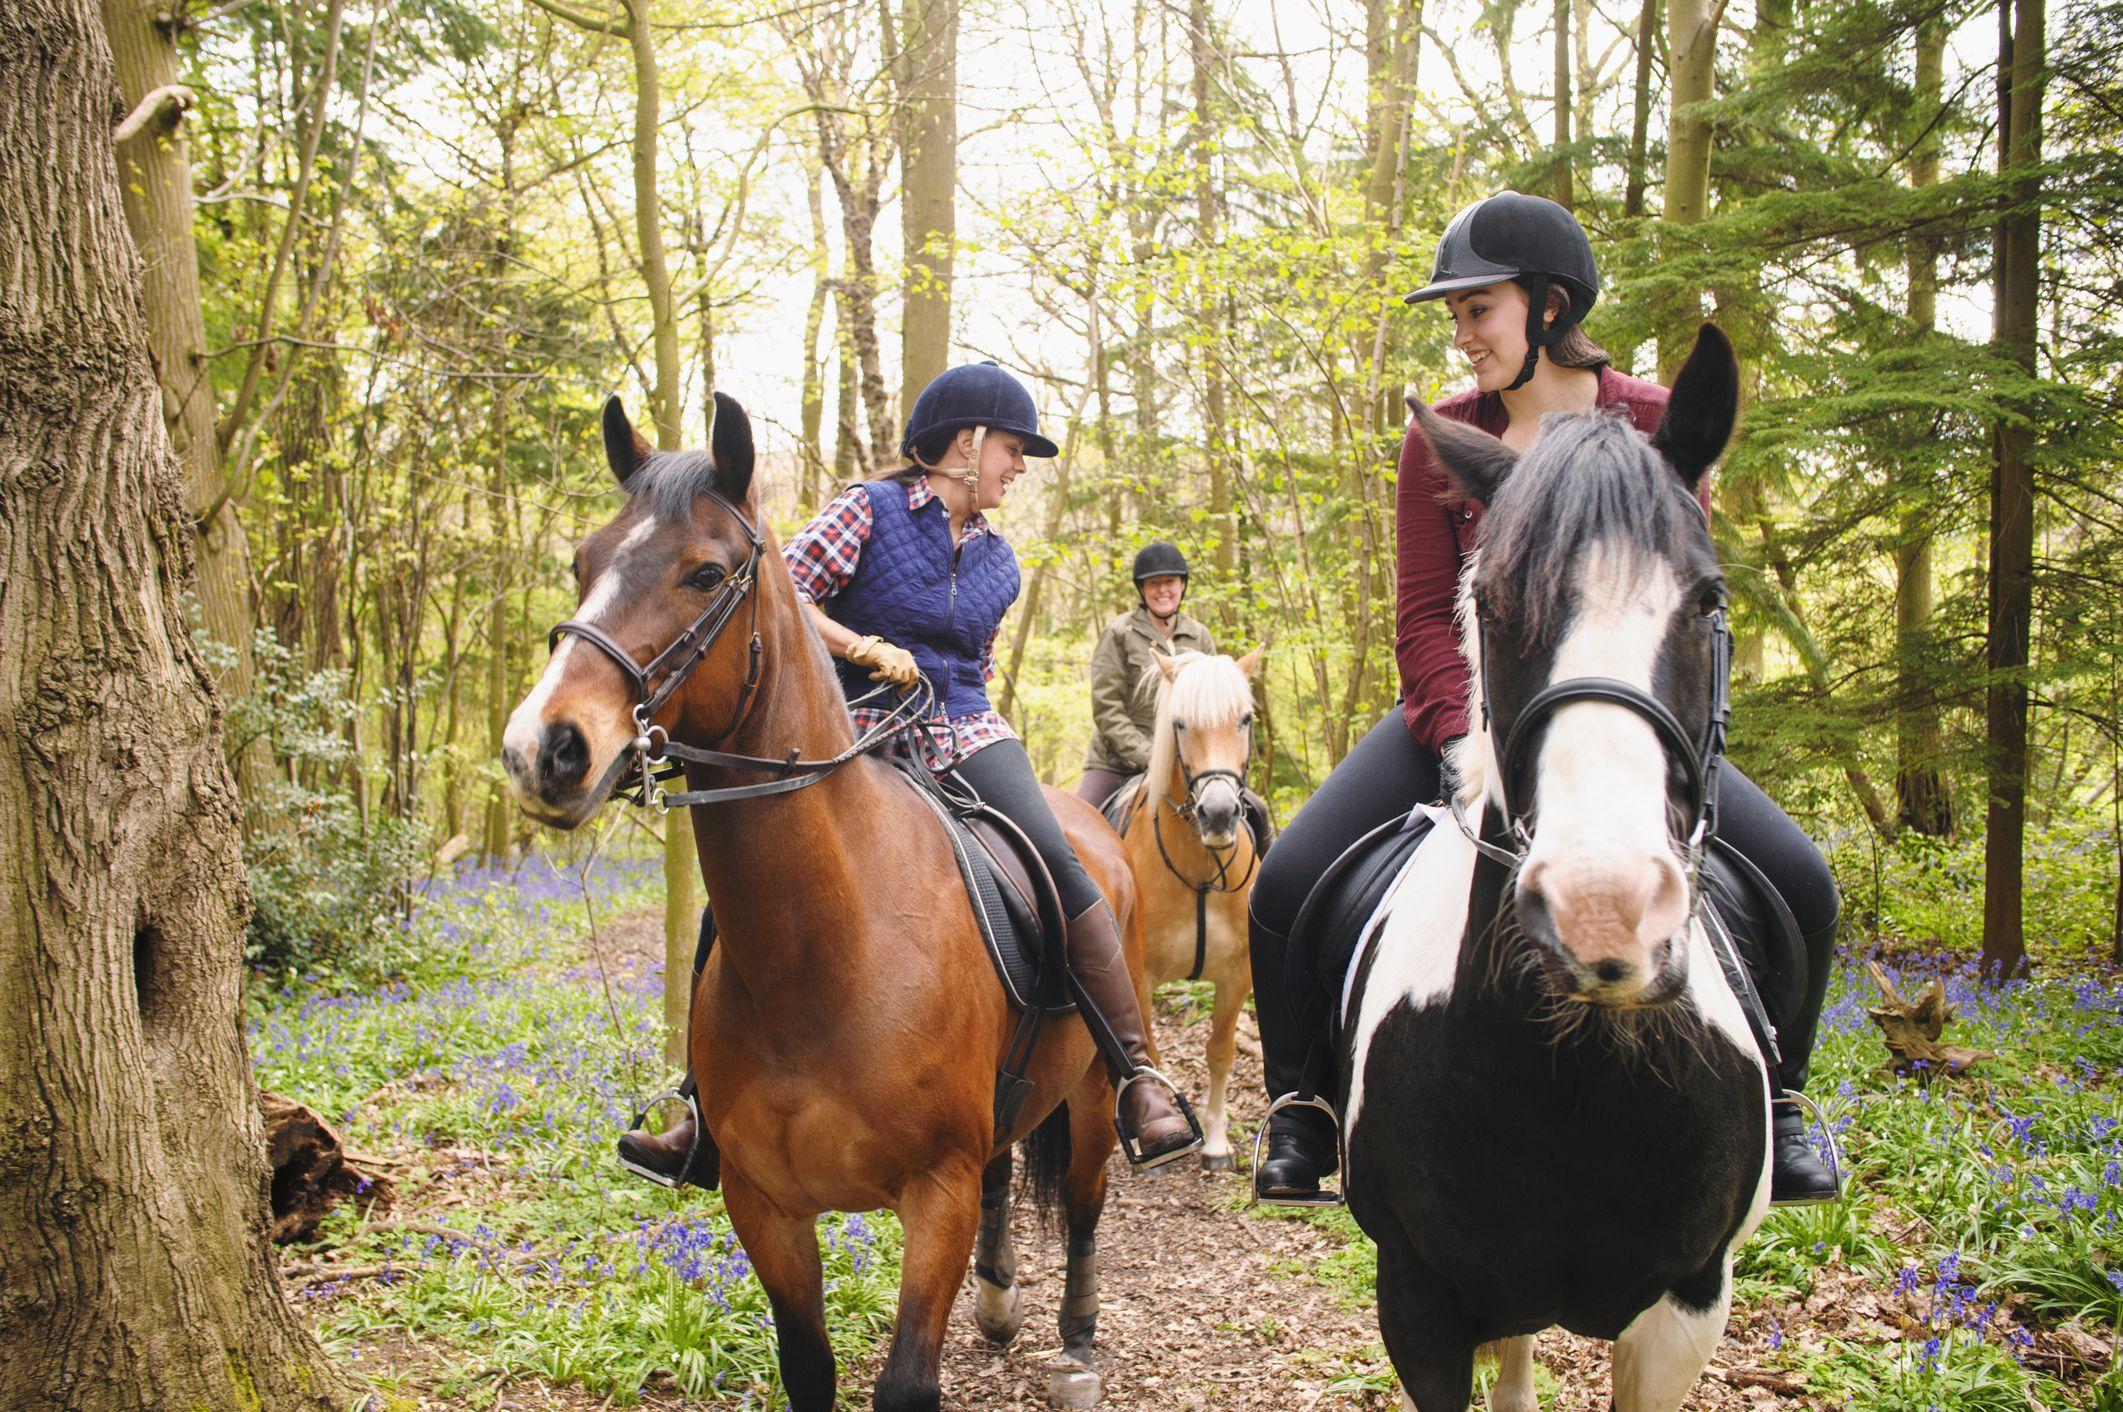 Safer Horseback Riding Wearing Protective Equipment